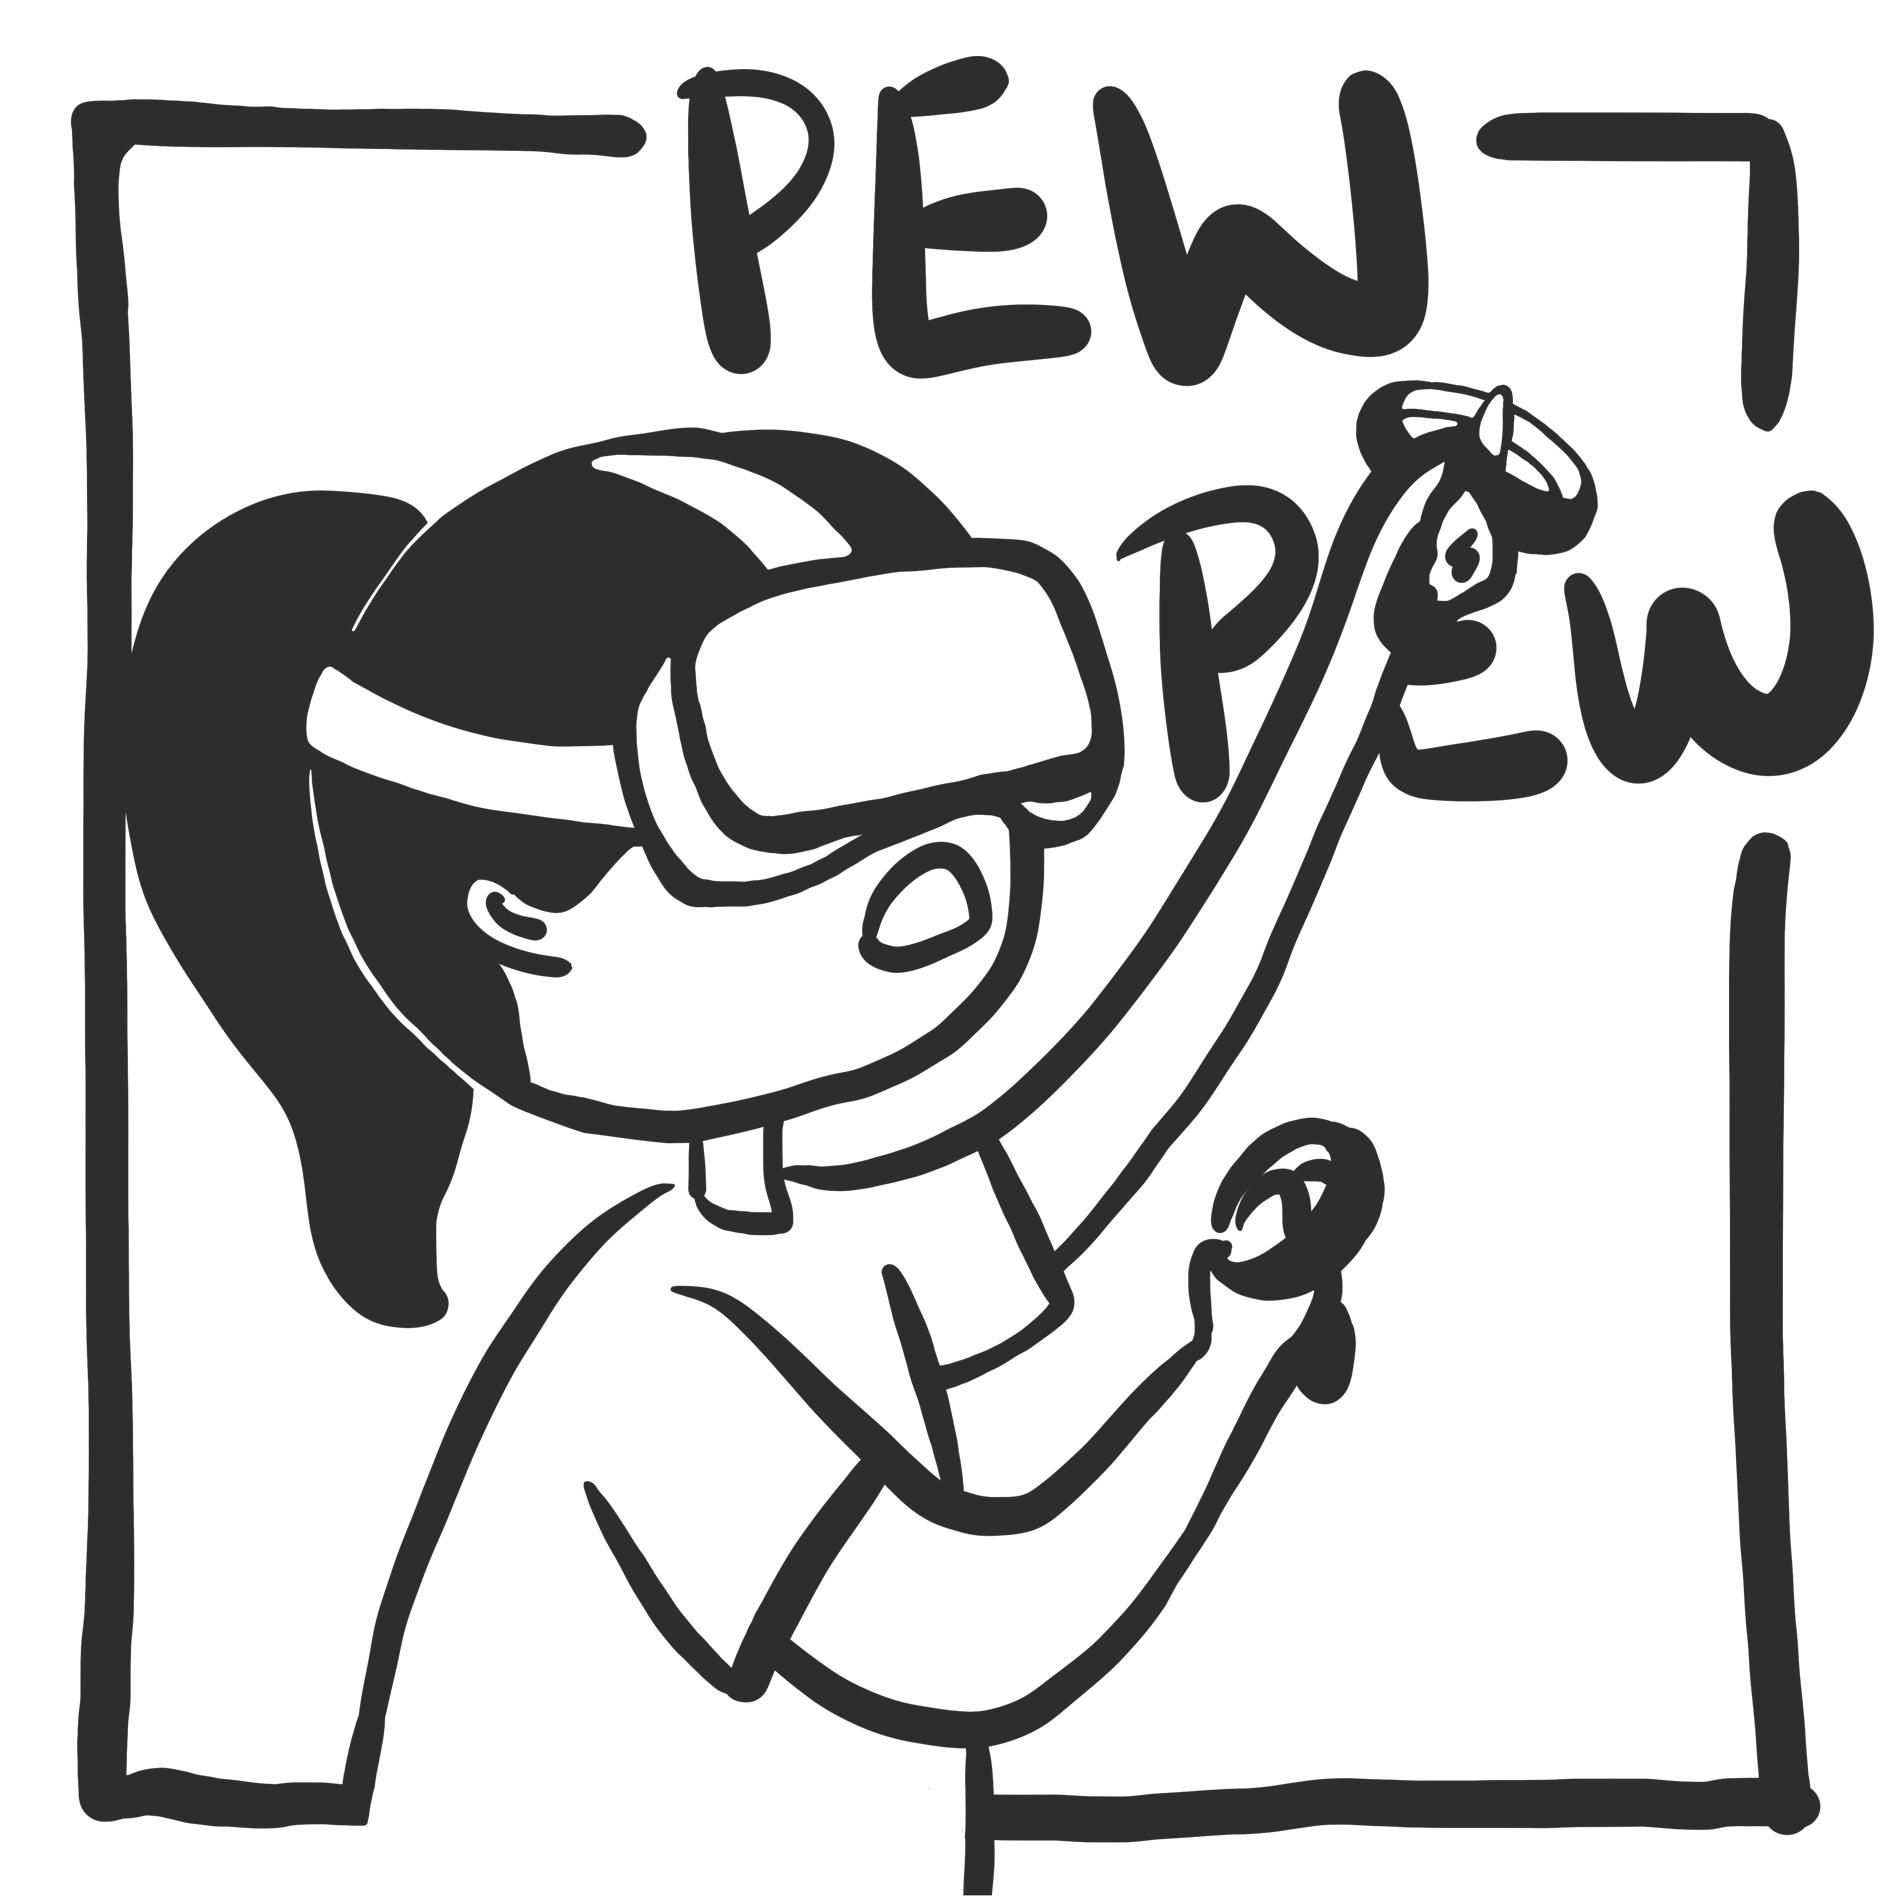 Pew pew: virtual reality gaming